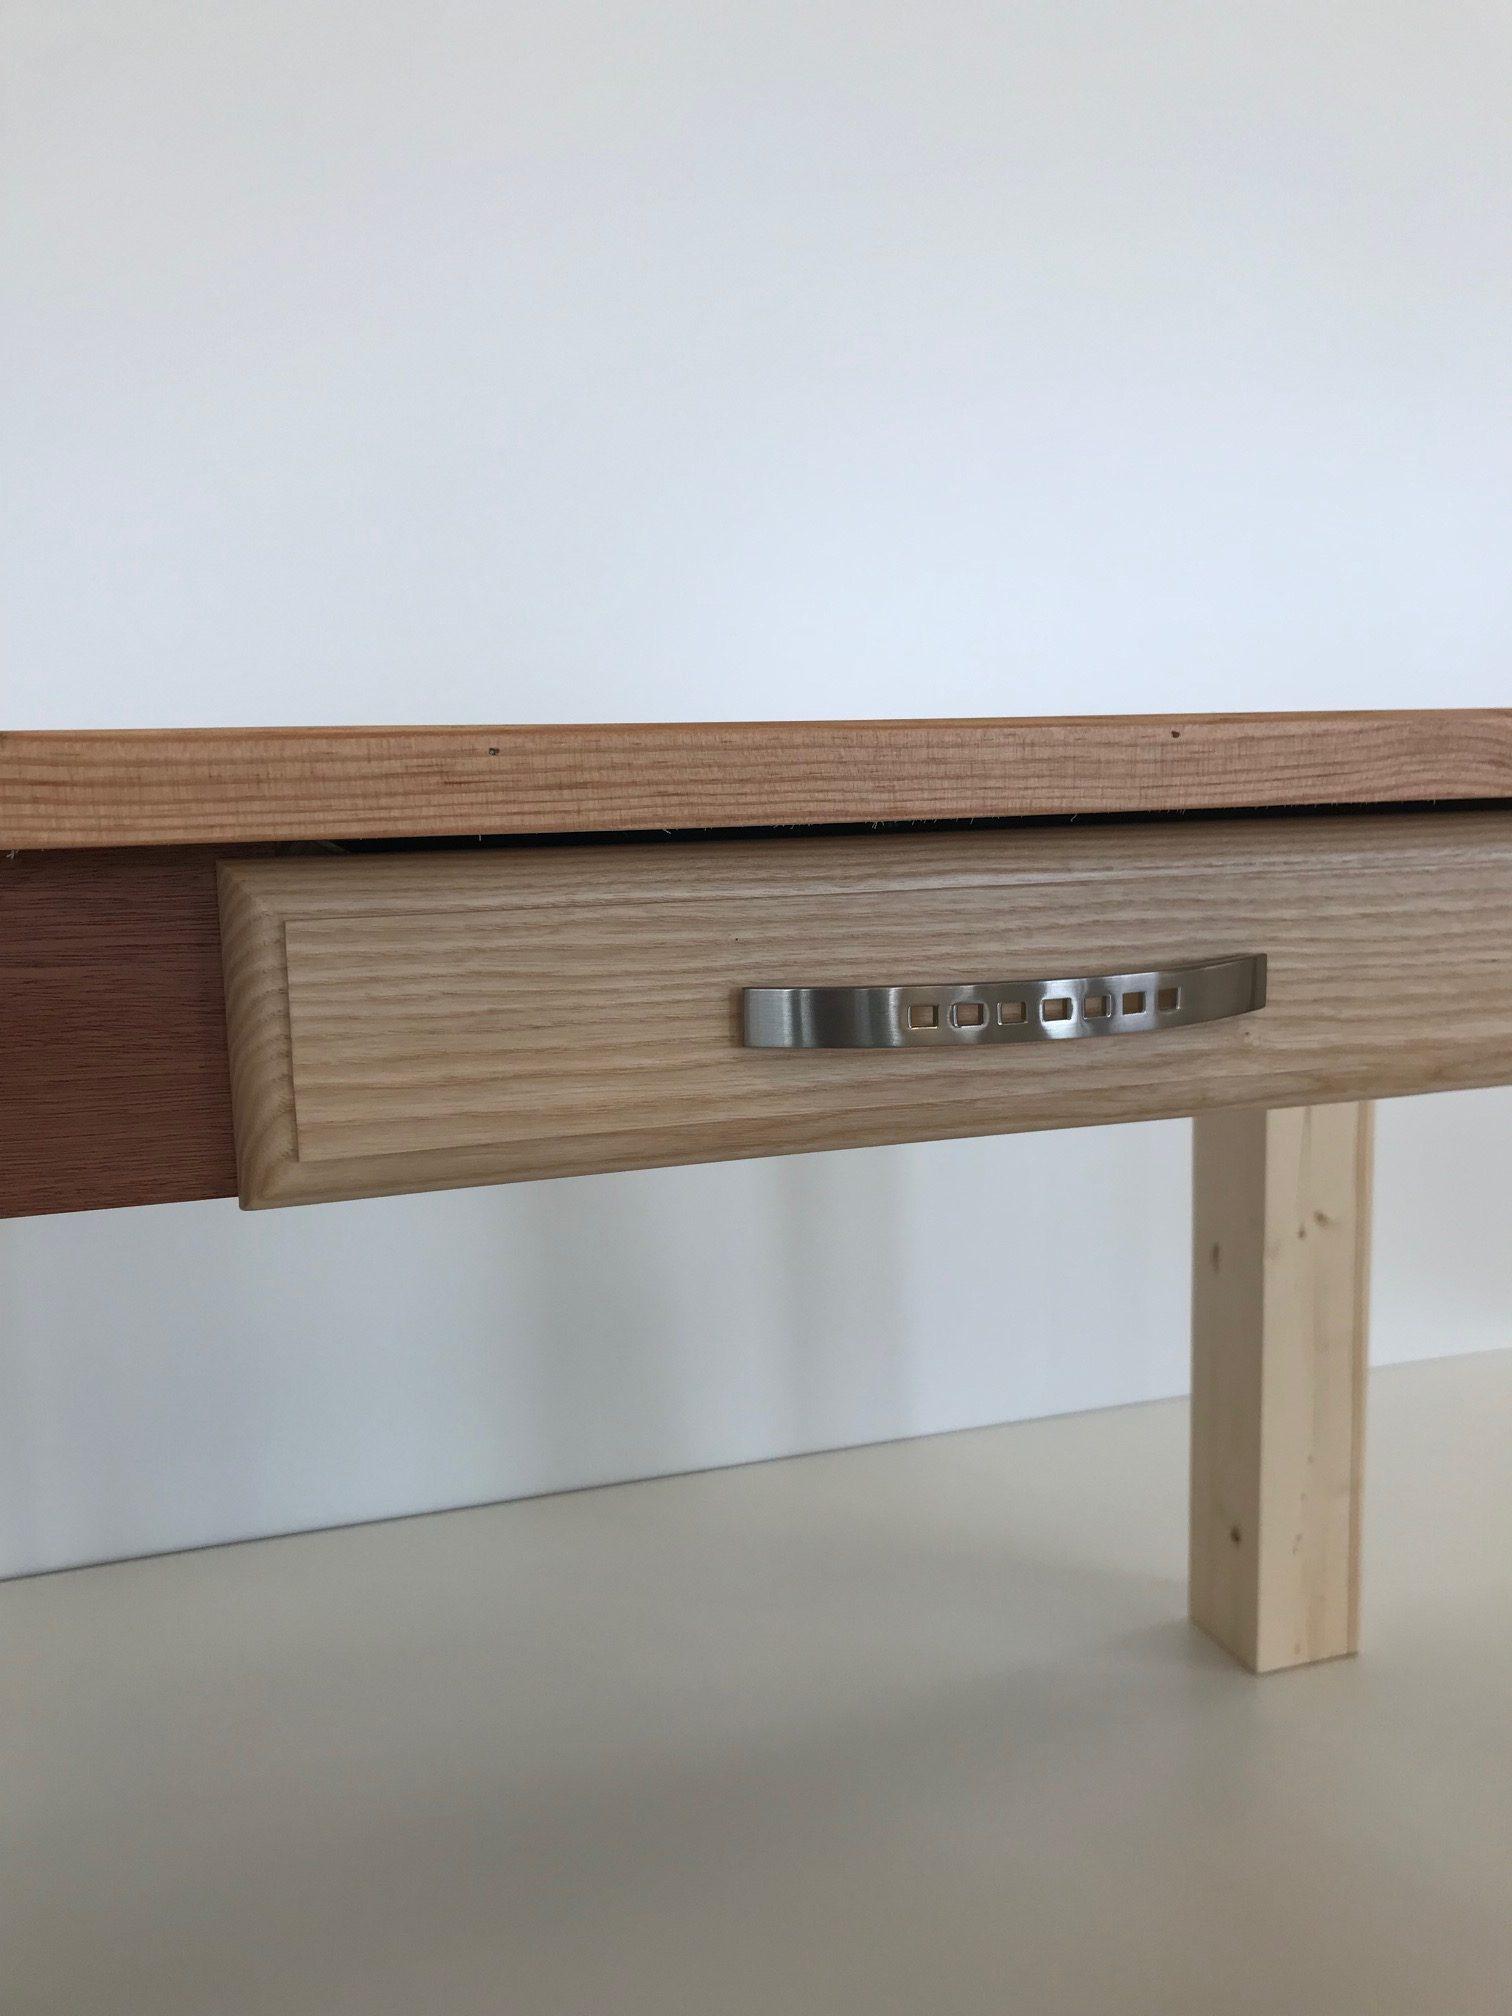 ébeniste, fabrication table, made in france, artisan français, meuble sur mesure